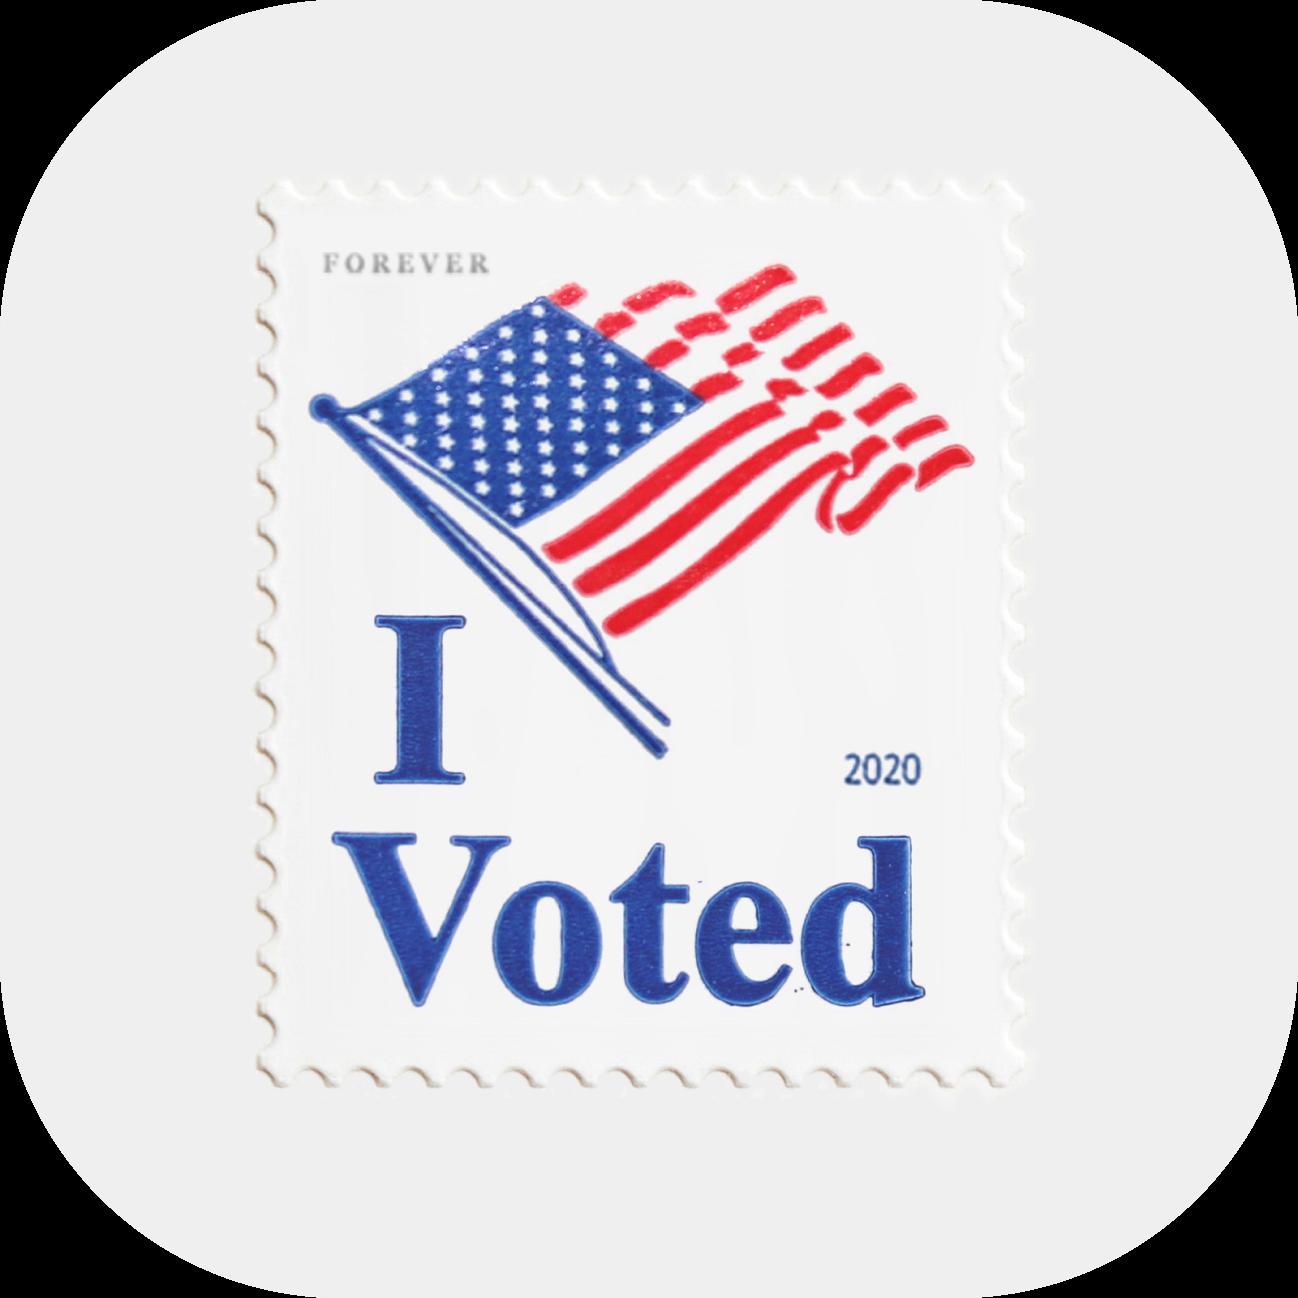 """I Voted"" Stamp"